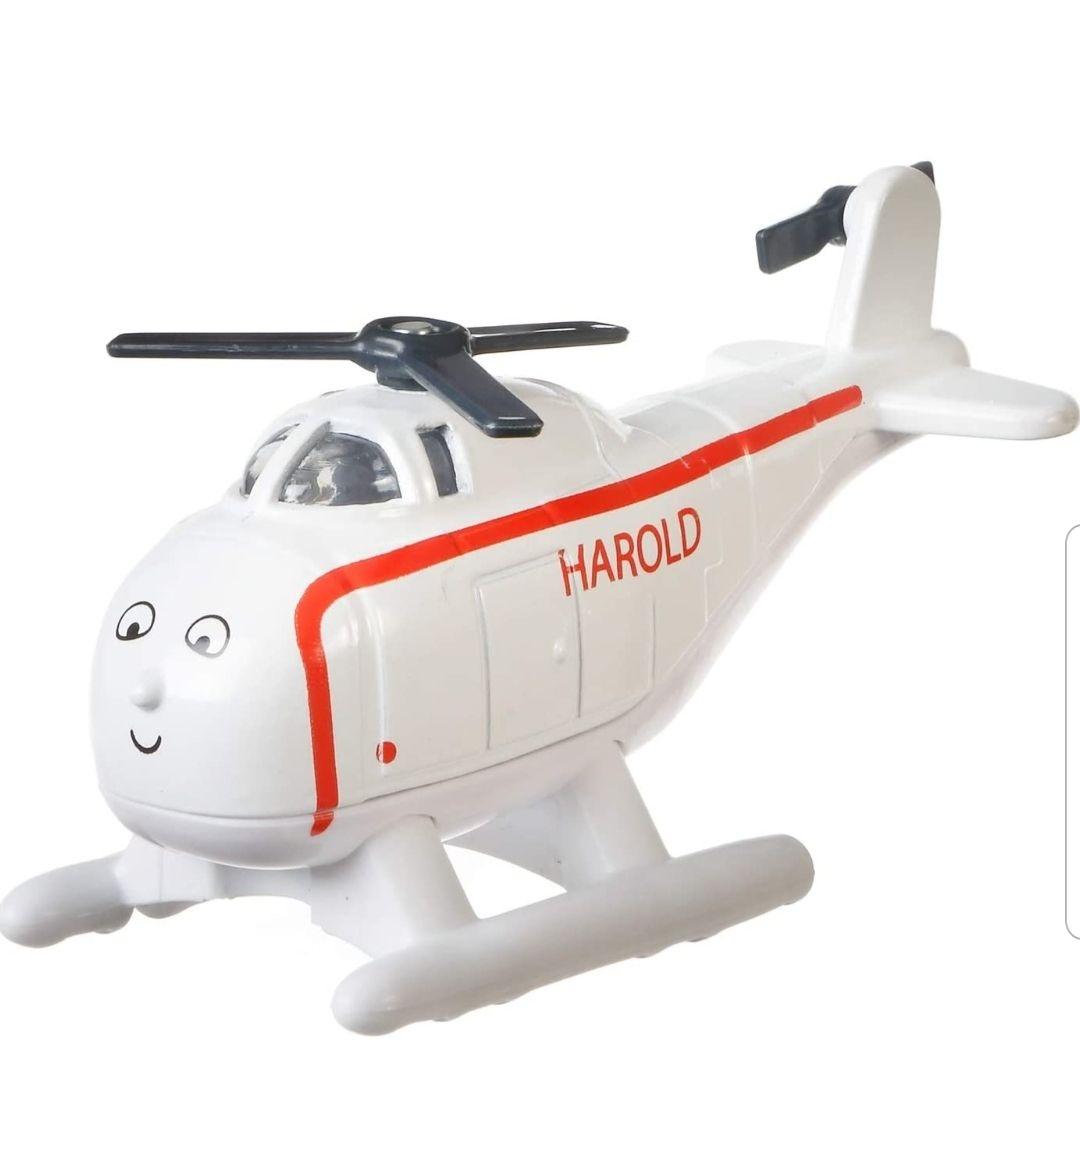 Thomas & Friends Trackmaster, Push Along Harold Metal Helicopter - £2.99 Prime / +£4.49 non Prime @ Amazon